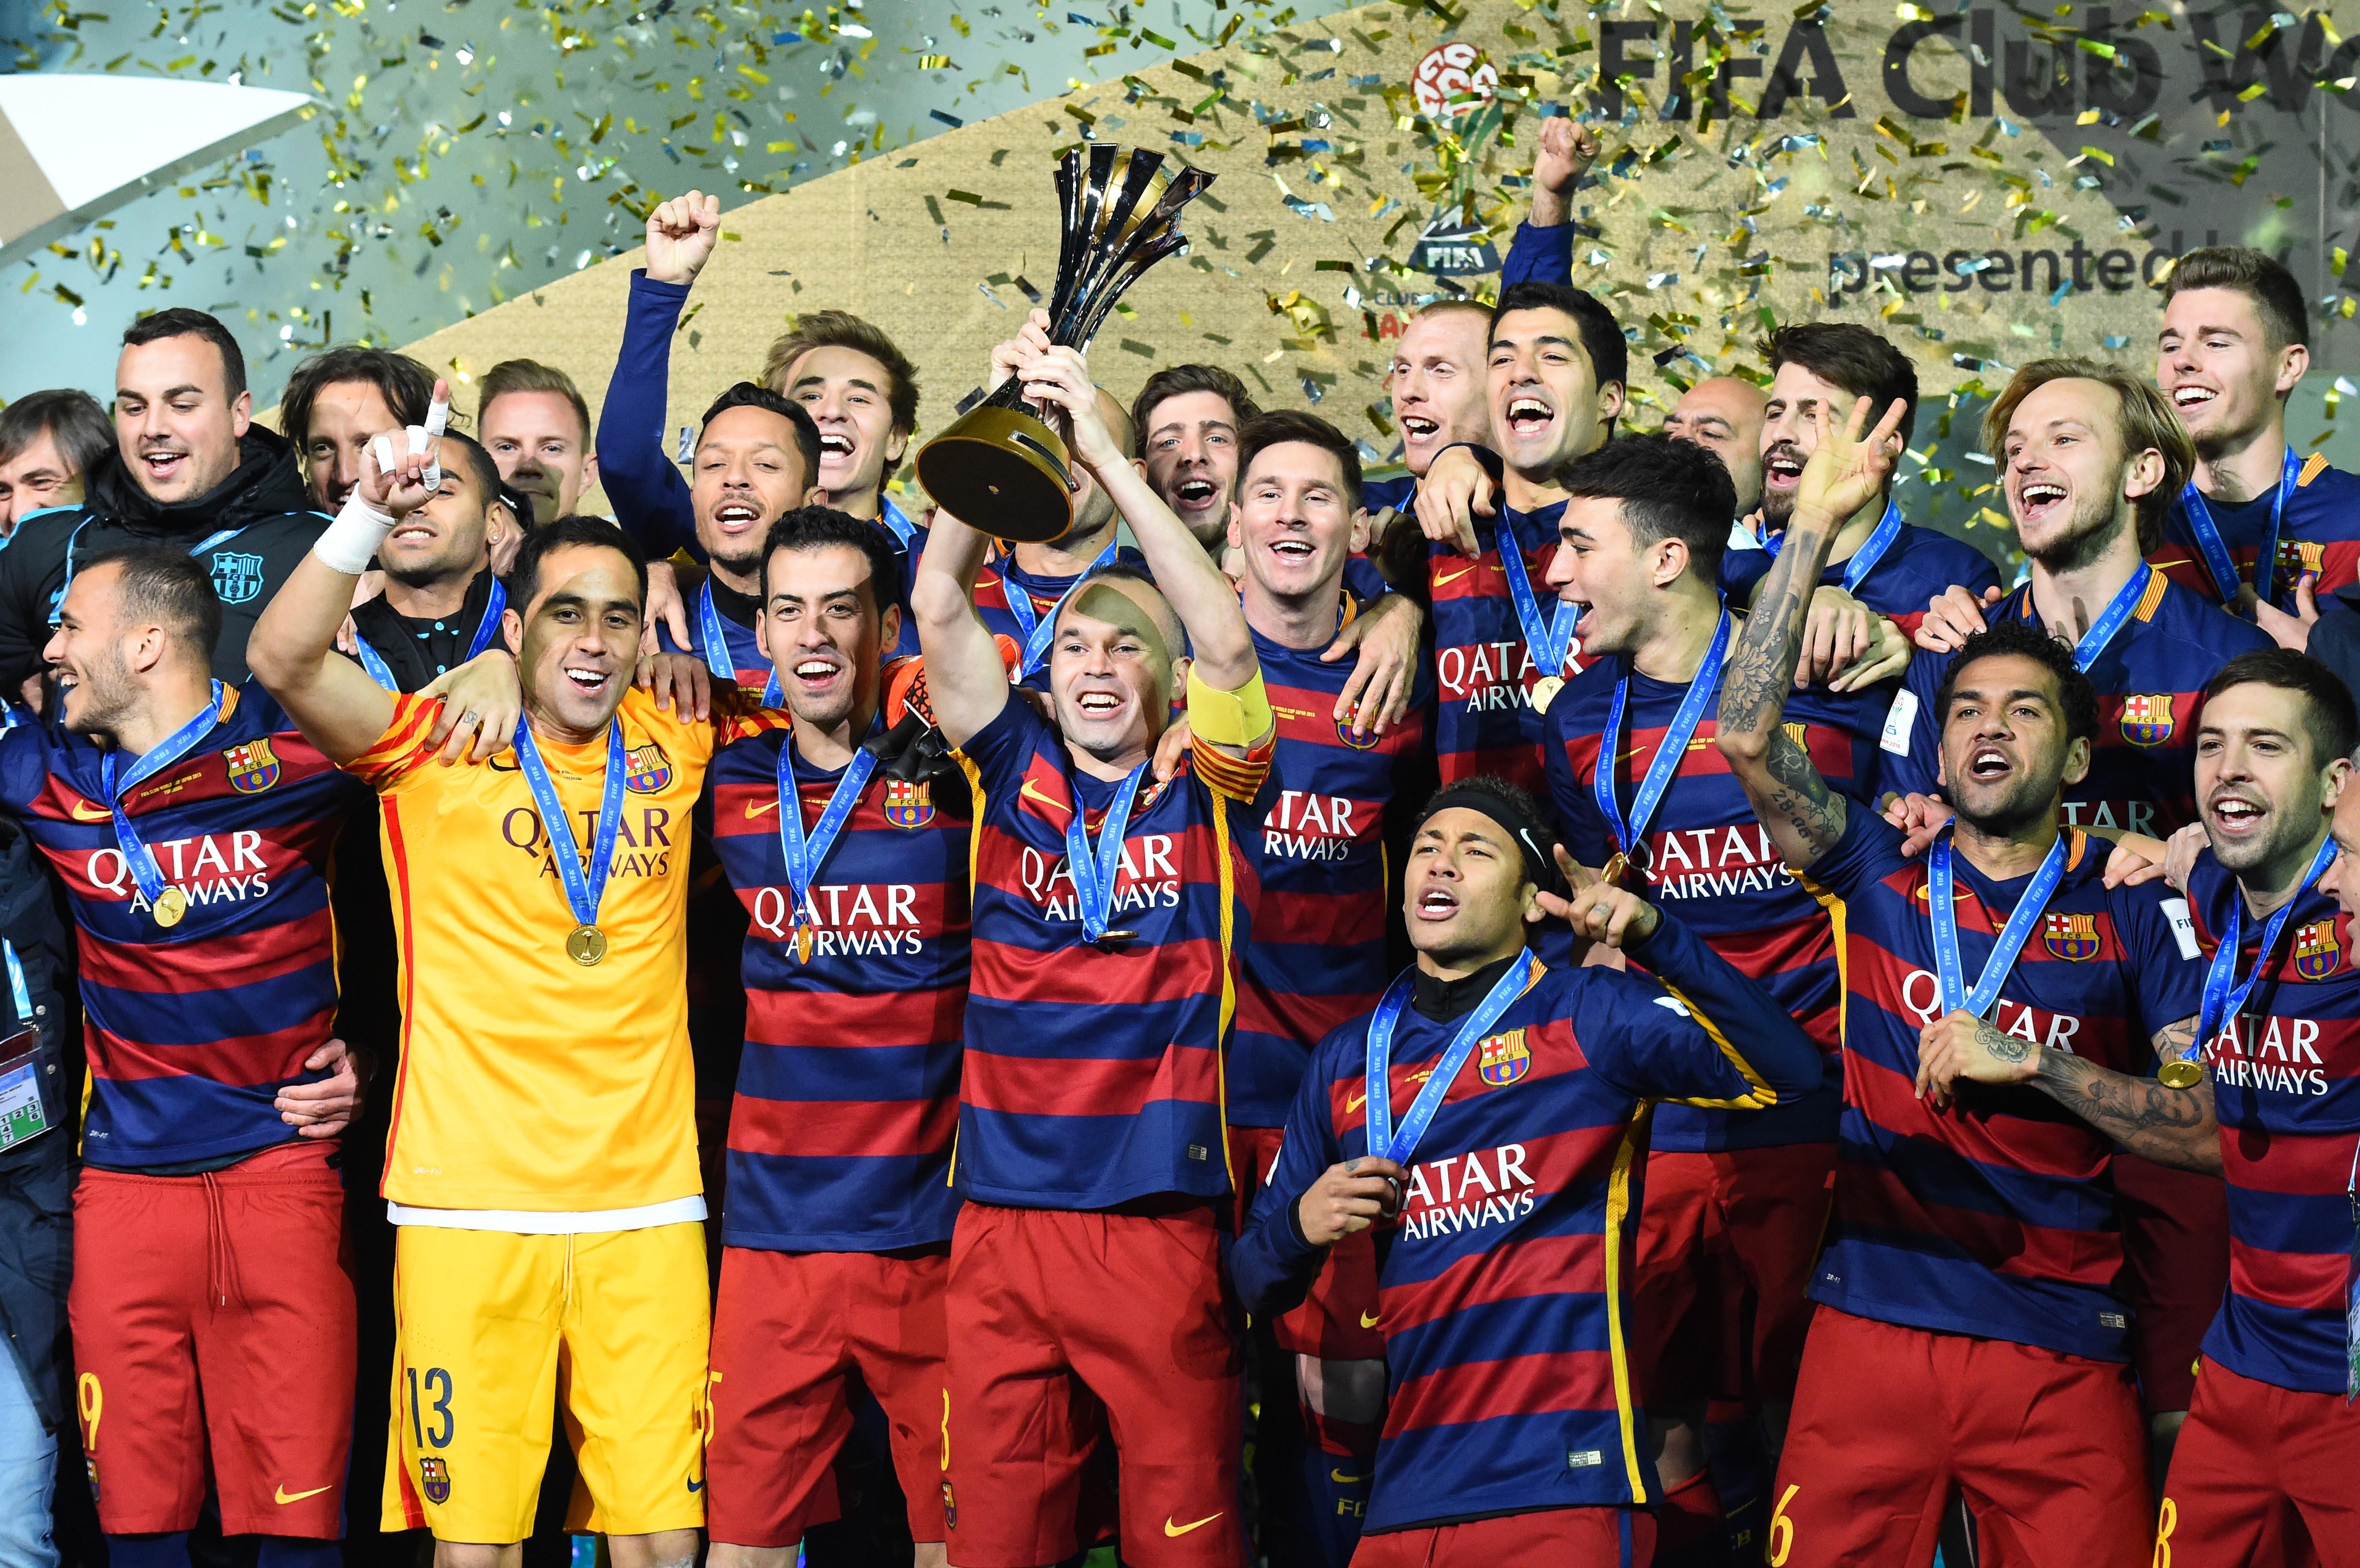 Mondial des clubs qui succ dera au fc barcelone football - Coupe du monde de handball 2015 calendrier ...